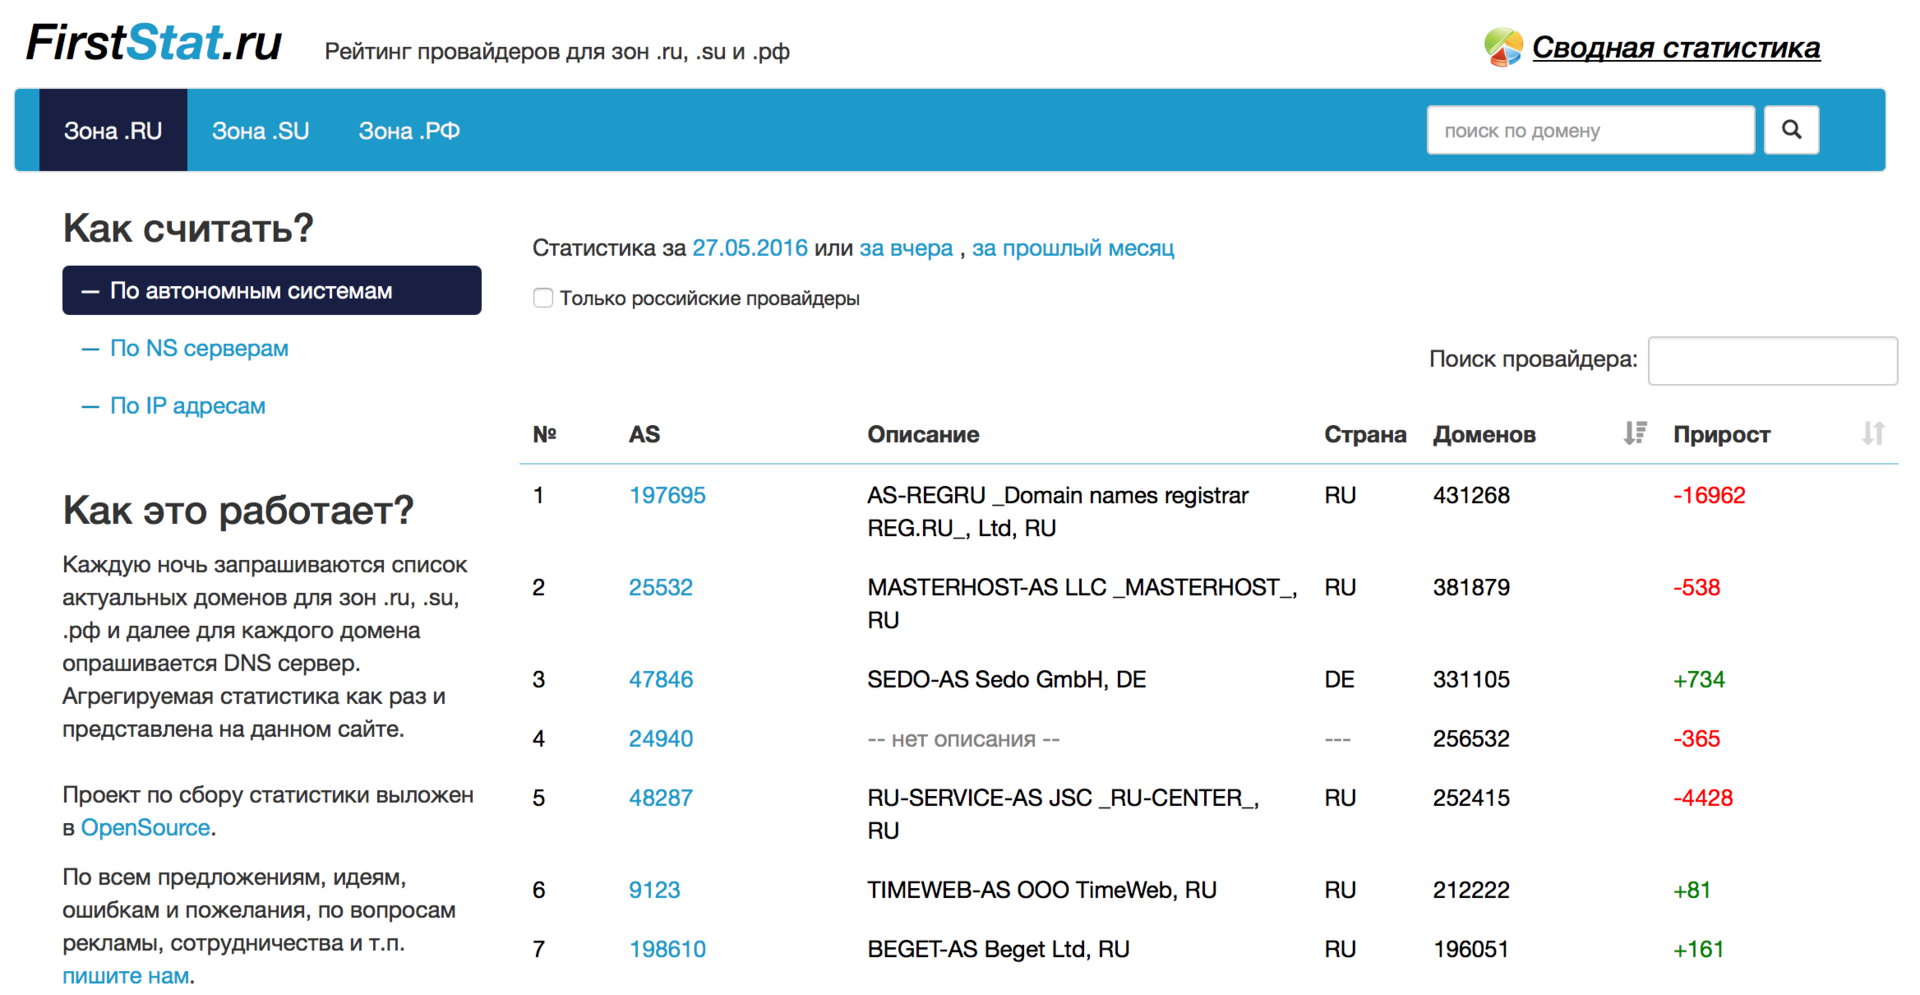 Статистика распределения доменов по AS, IP, NS, MX и прочим параметрам - 3